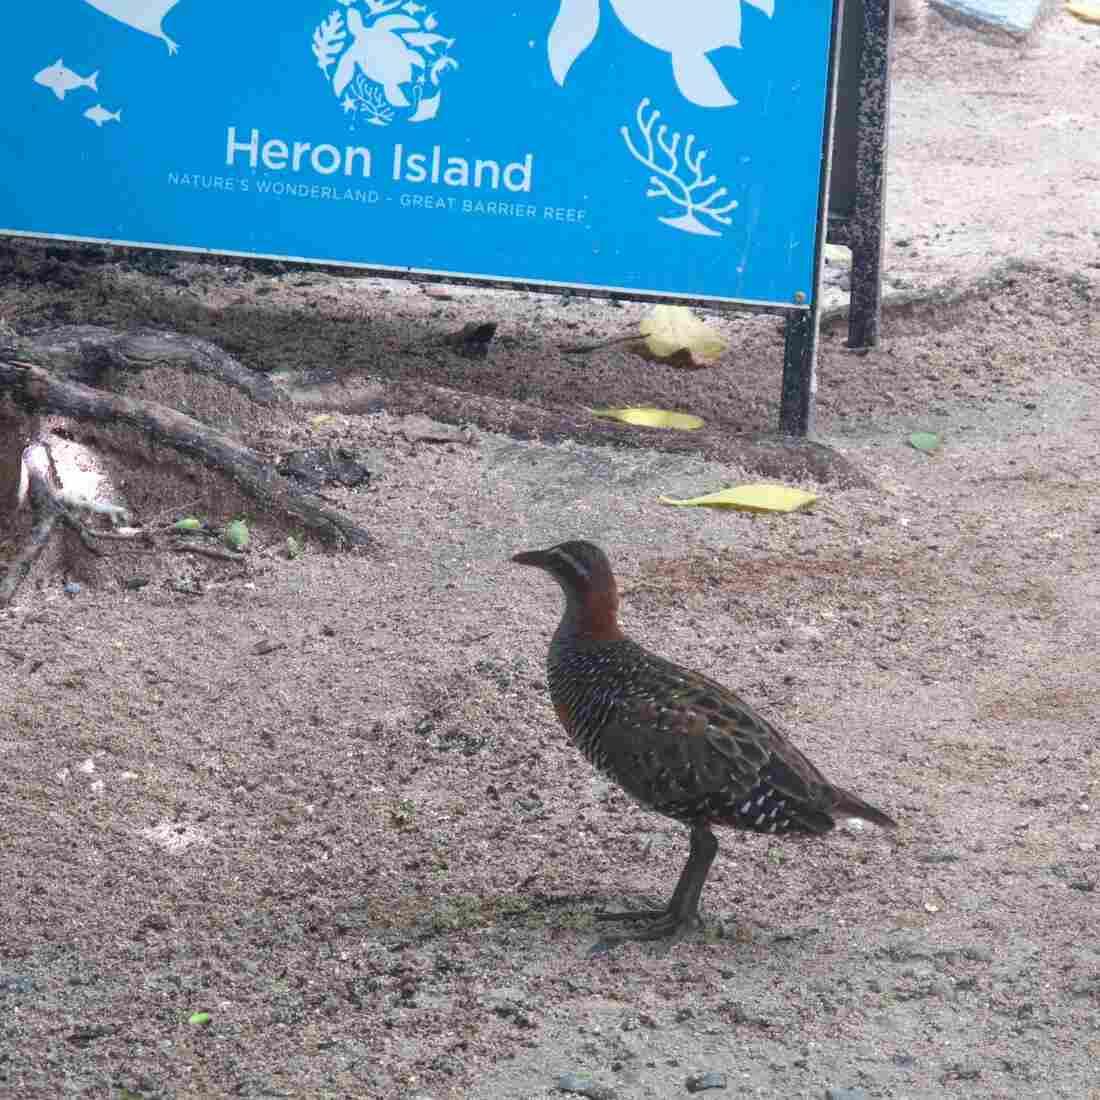 It's 'Birds Gone Wild' Out On Australia's Heron Island